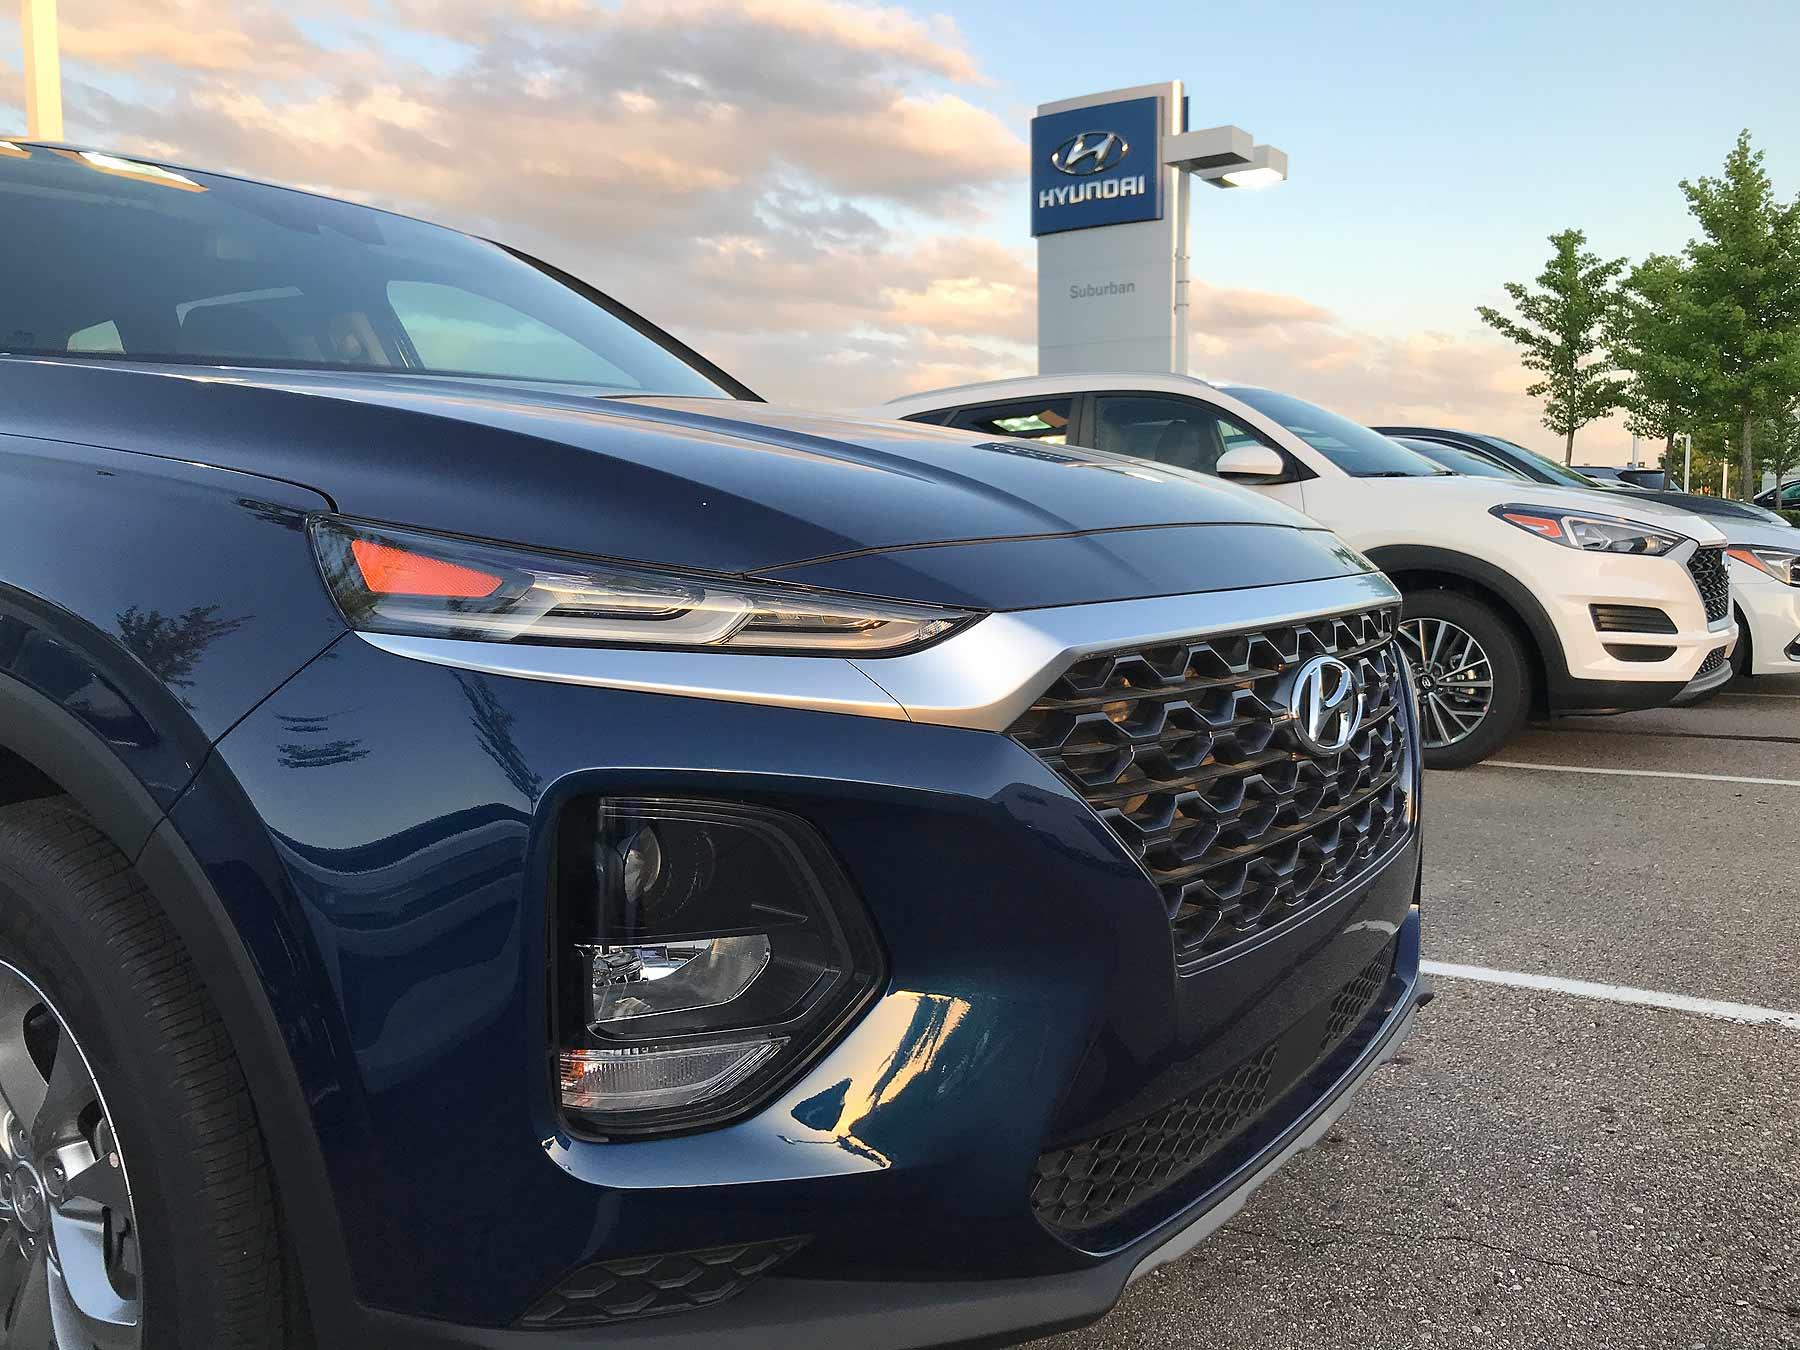 Hyundai Dealership Los Angeles >> May U S Auto Sales Hyundai Kia Shift To Crossovers